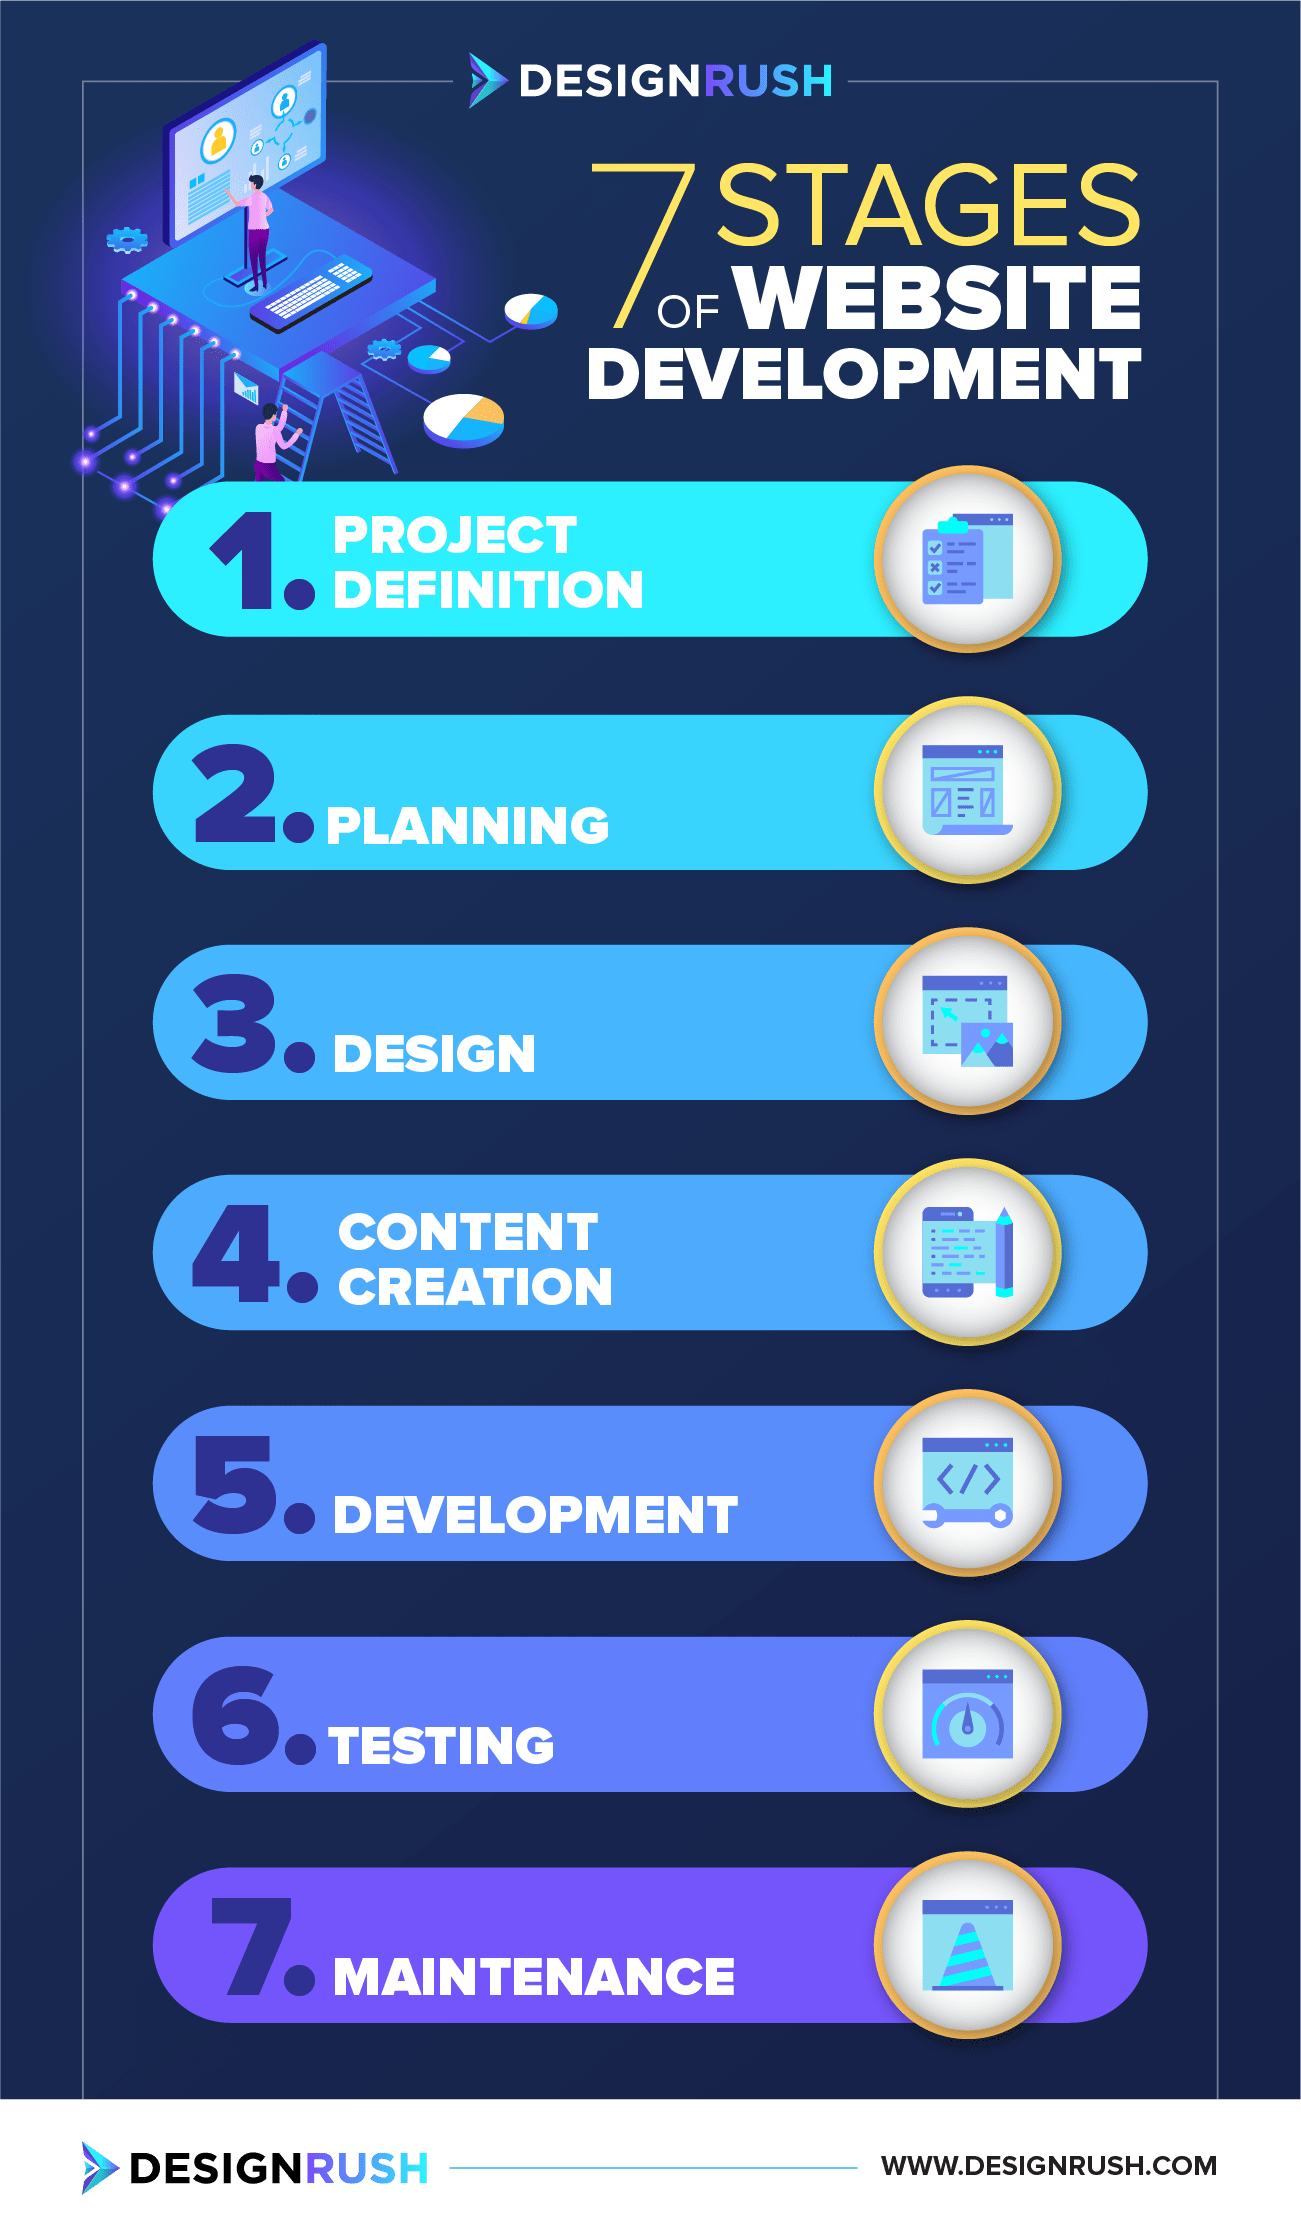 7 stages of website development